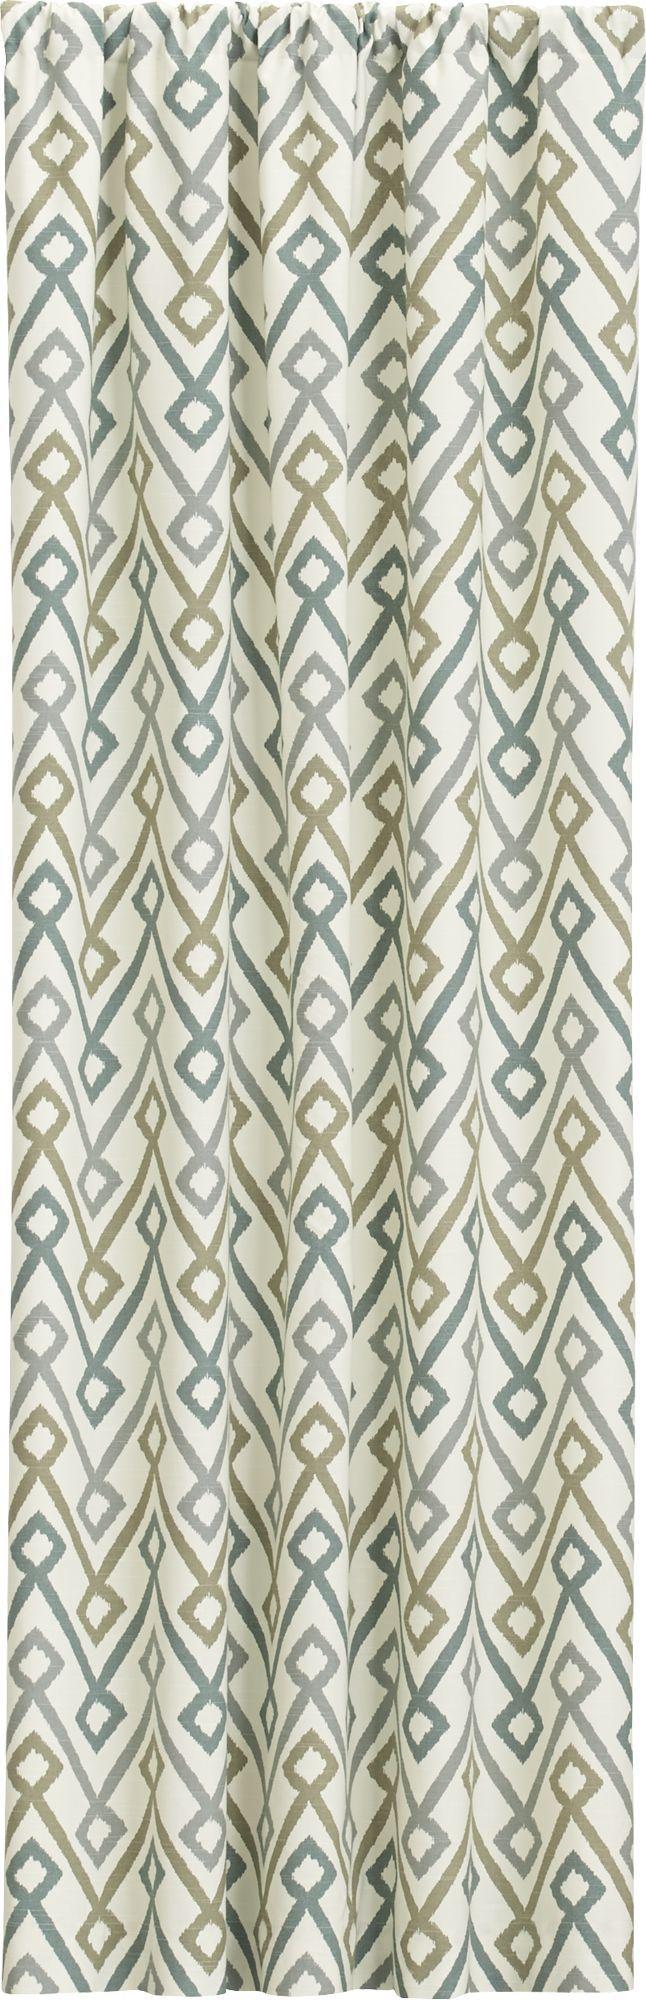 Cotenza modern curtains nice modern net curtains simple modern curtain - Maddox Khaki Grey Curtains